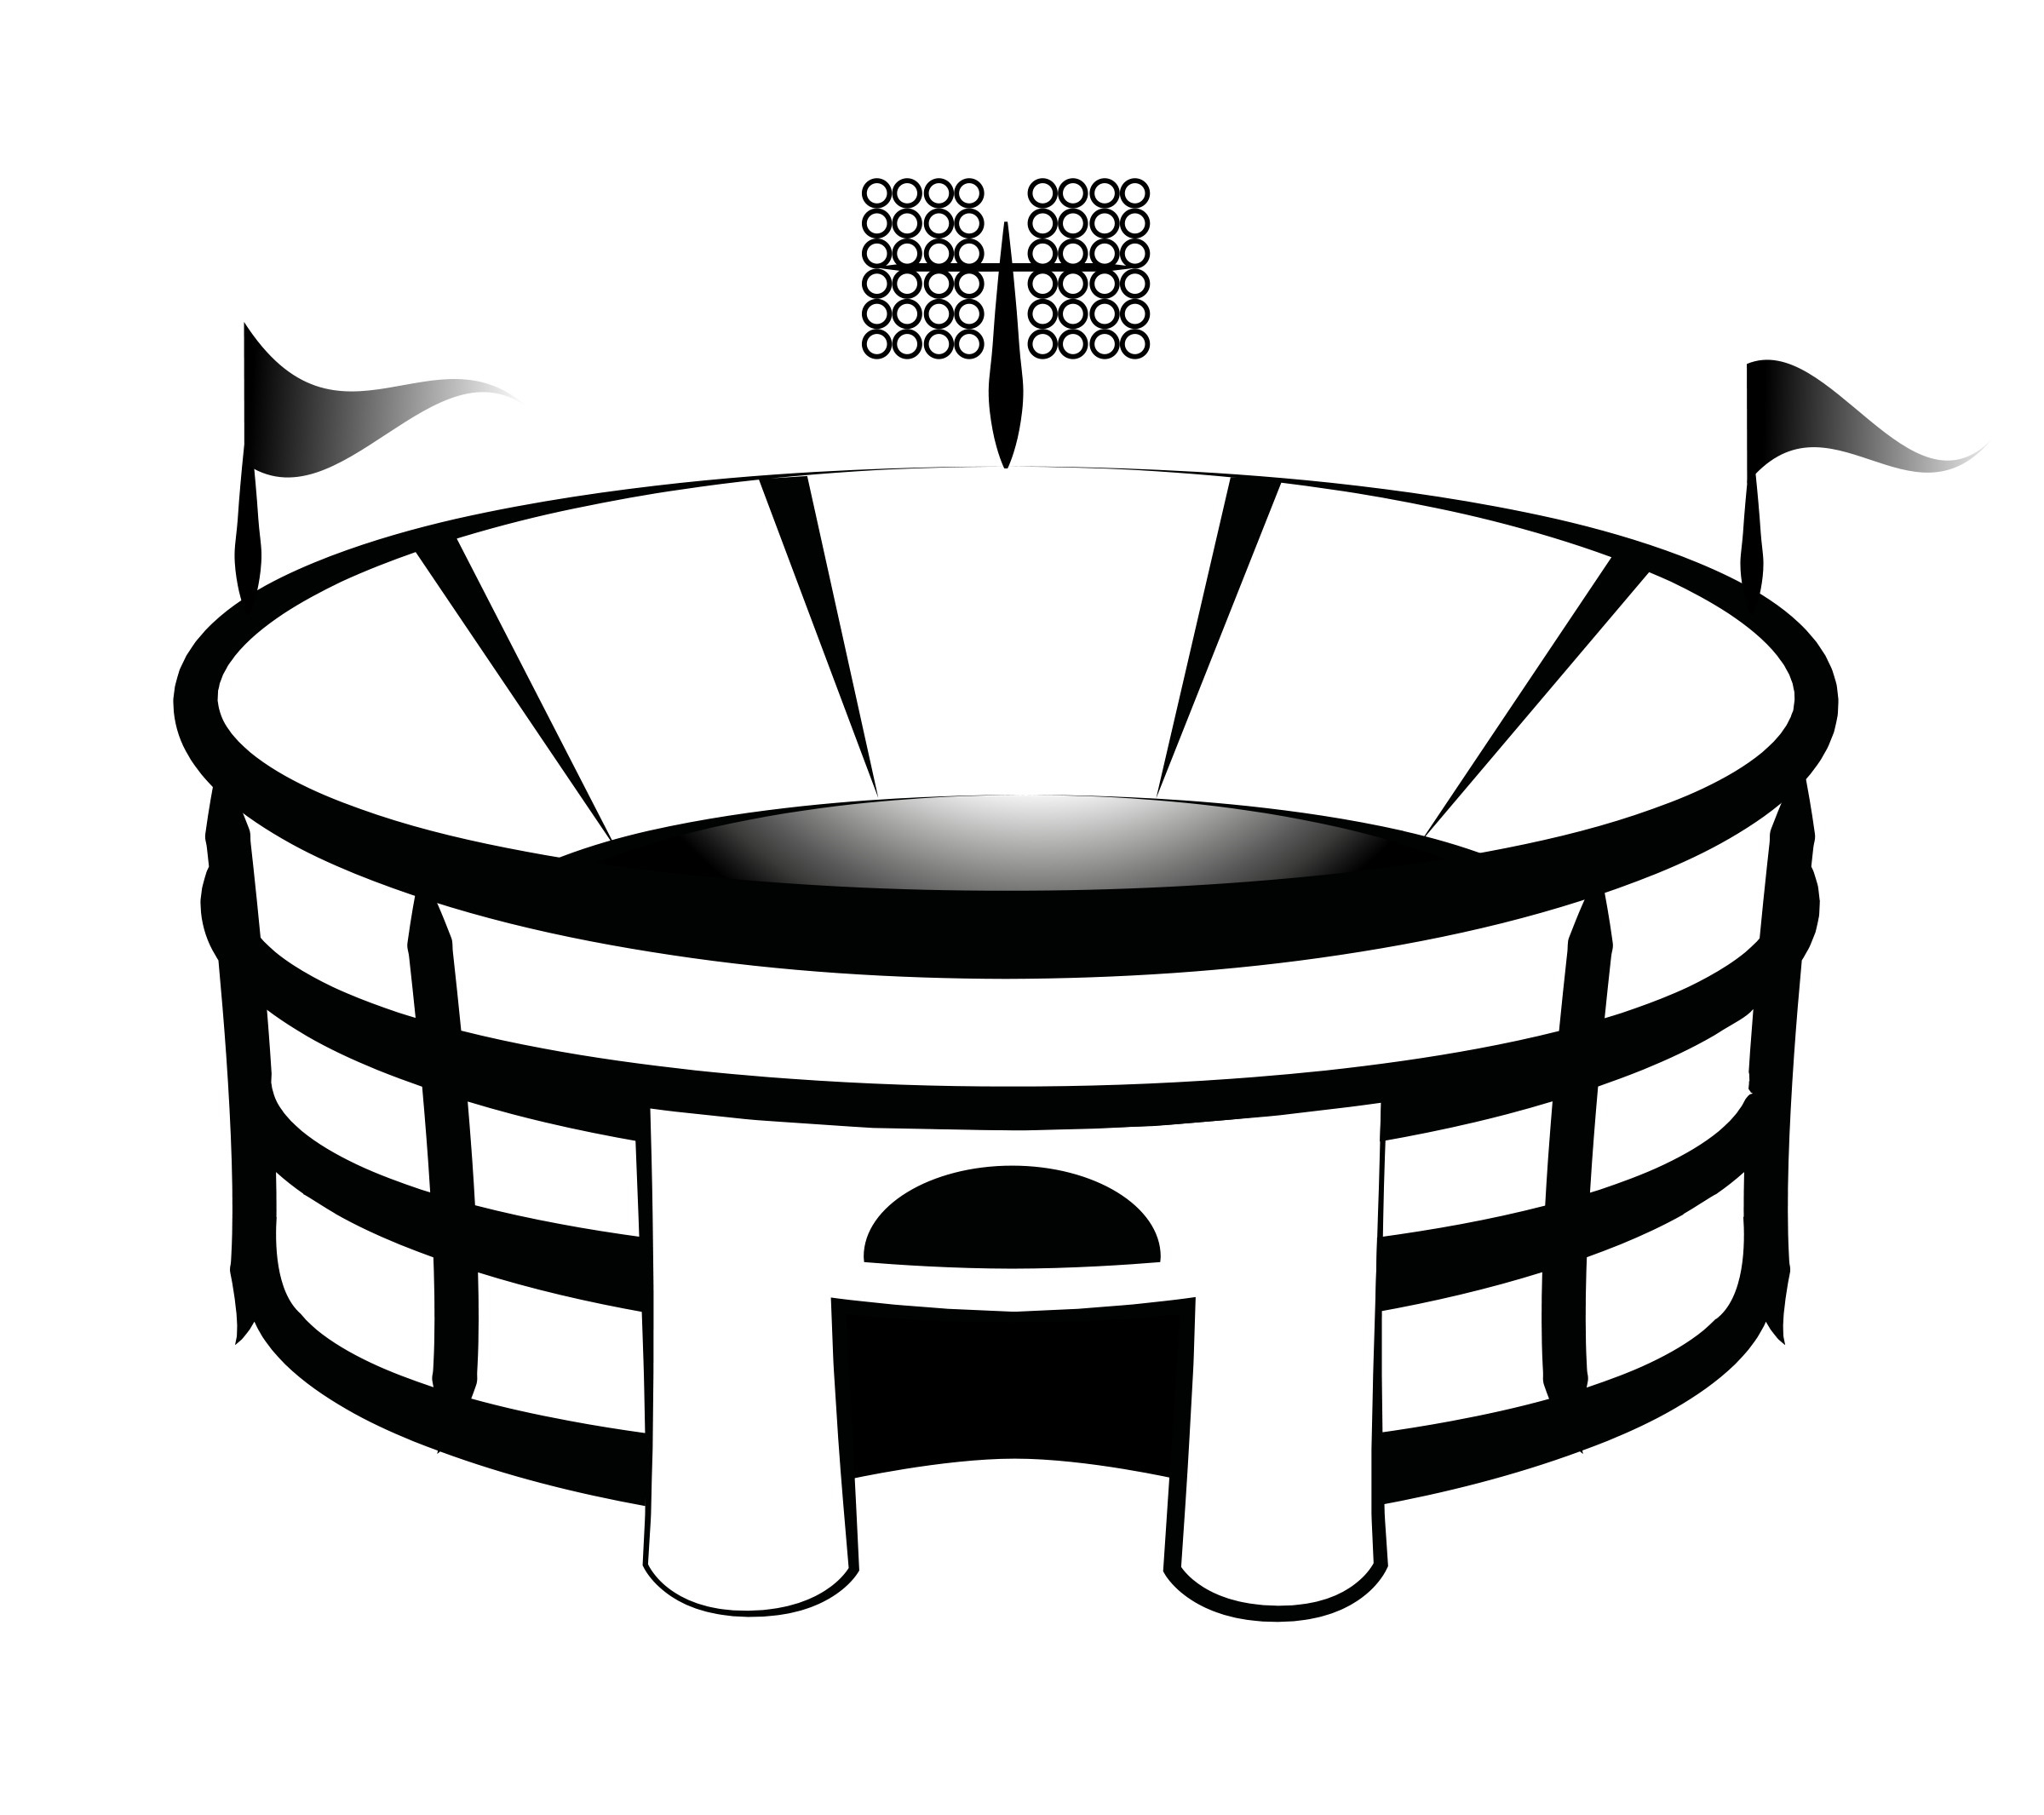 Football Stadium Clipart Clipart Panda F-Football Stadium Clipart Clipart Panda Free Clipart Images-9